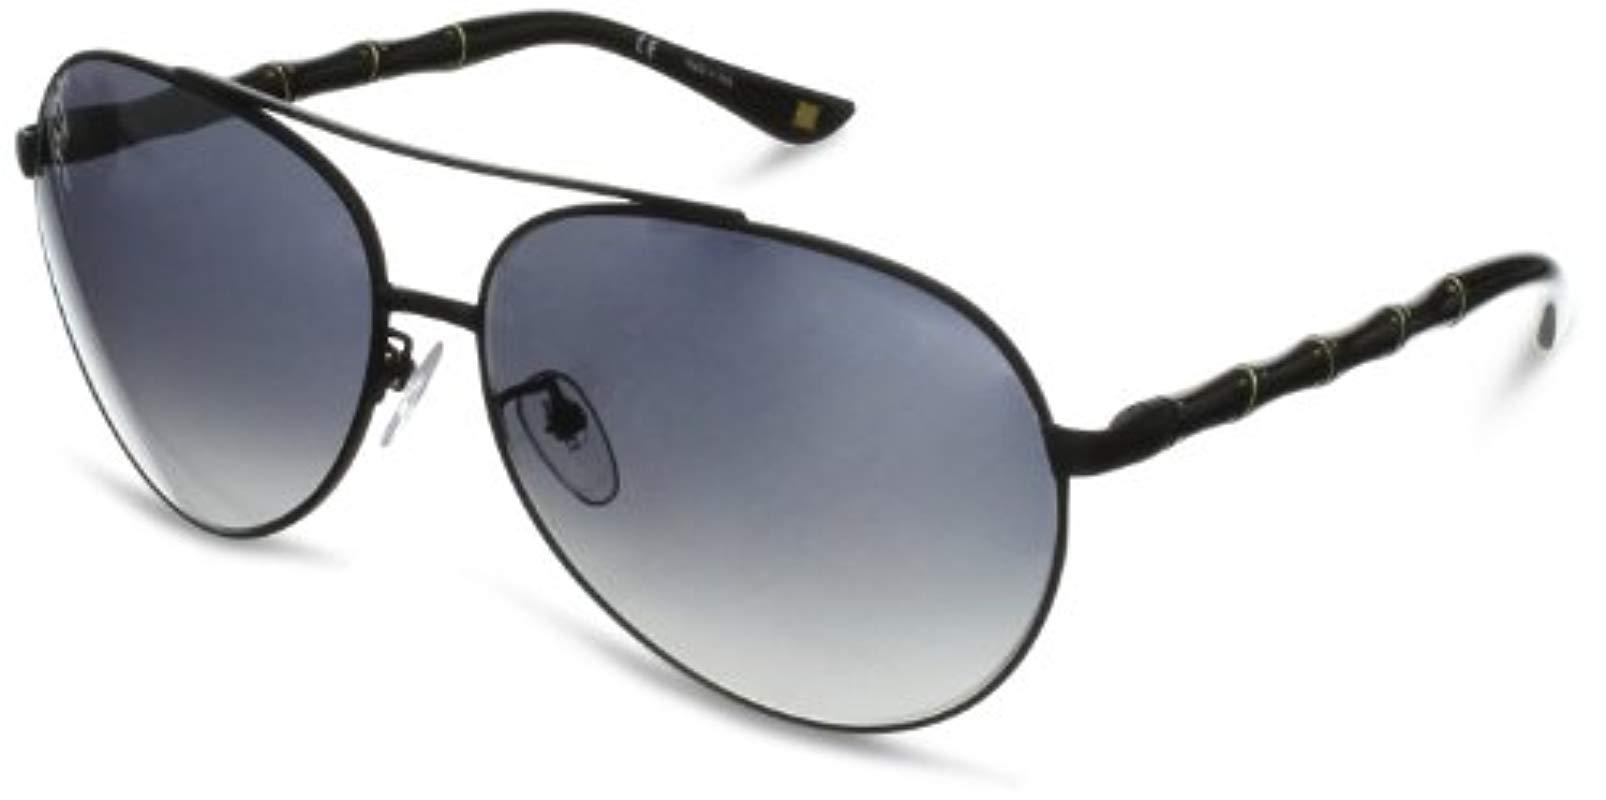 5fe61930612 Lyst - ESCADA Sunglasses Ses775-531x Aviator Non-polarized ...